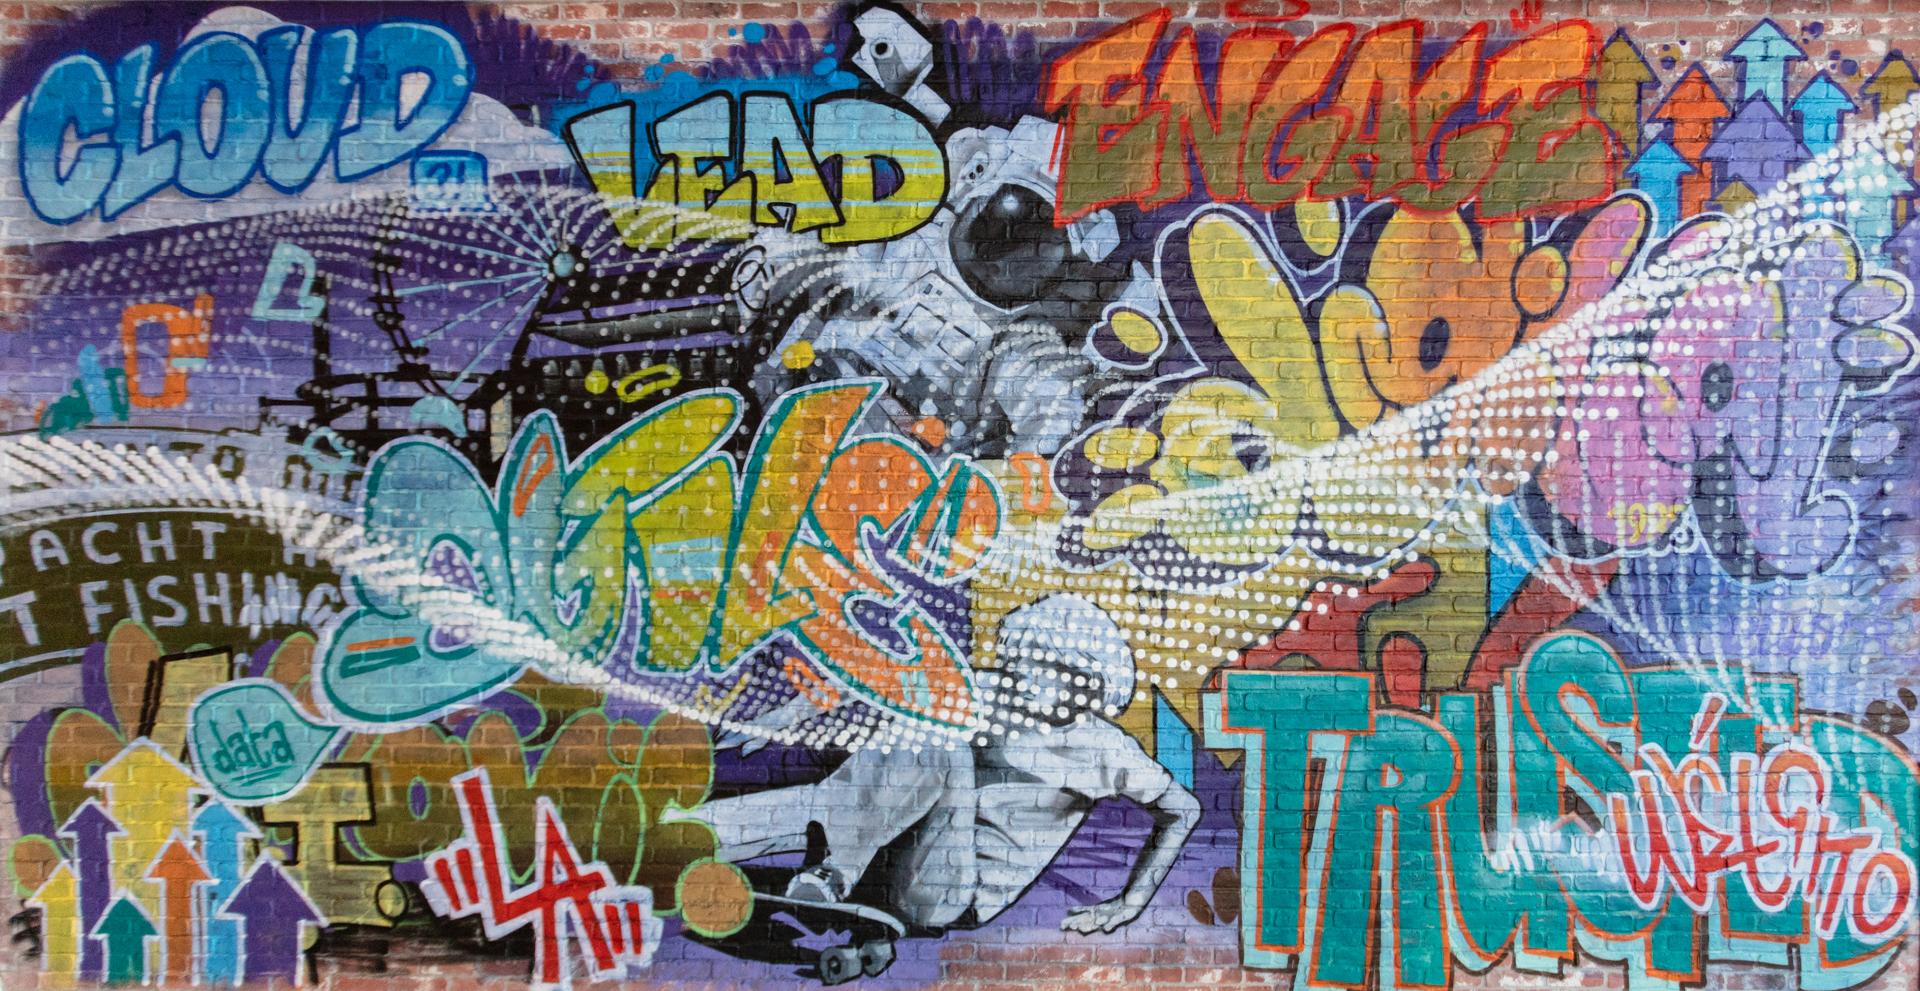 santa Monica Wetiko mural.jpg